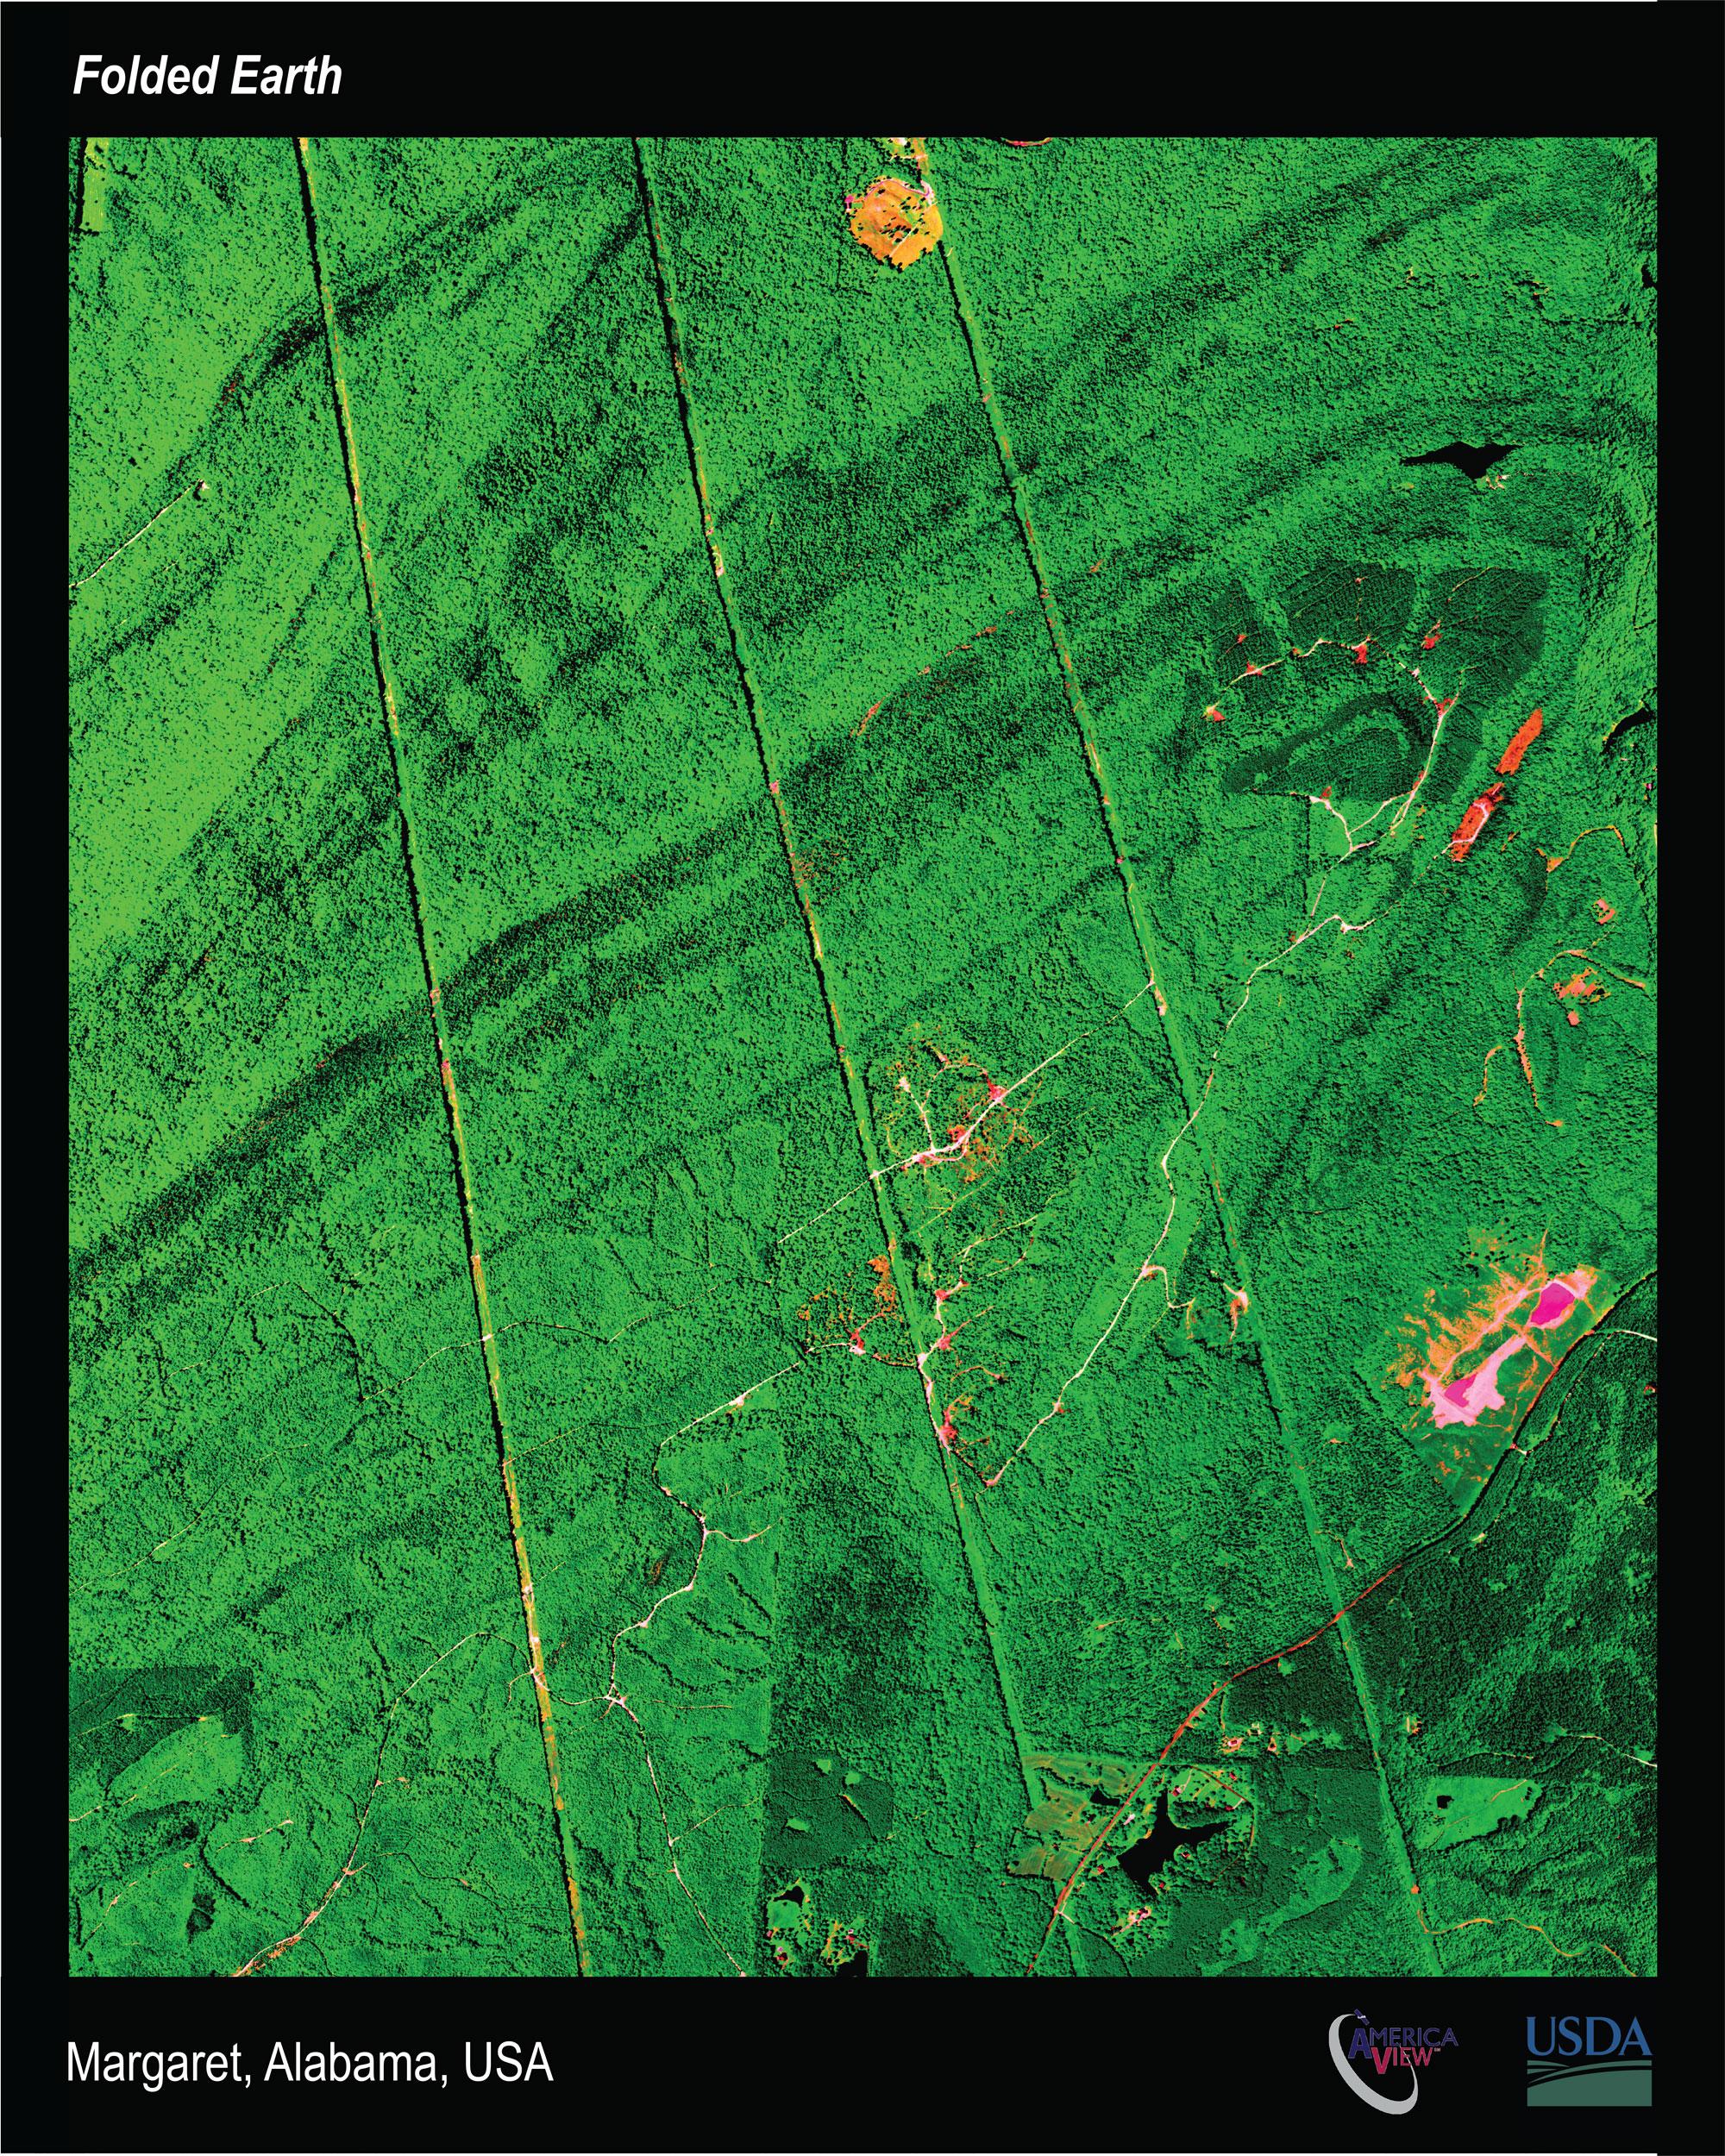 Satellite images of Margaret, Alabama